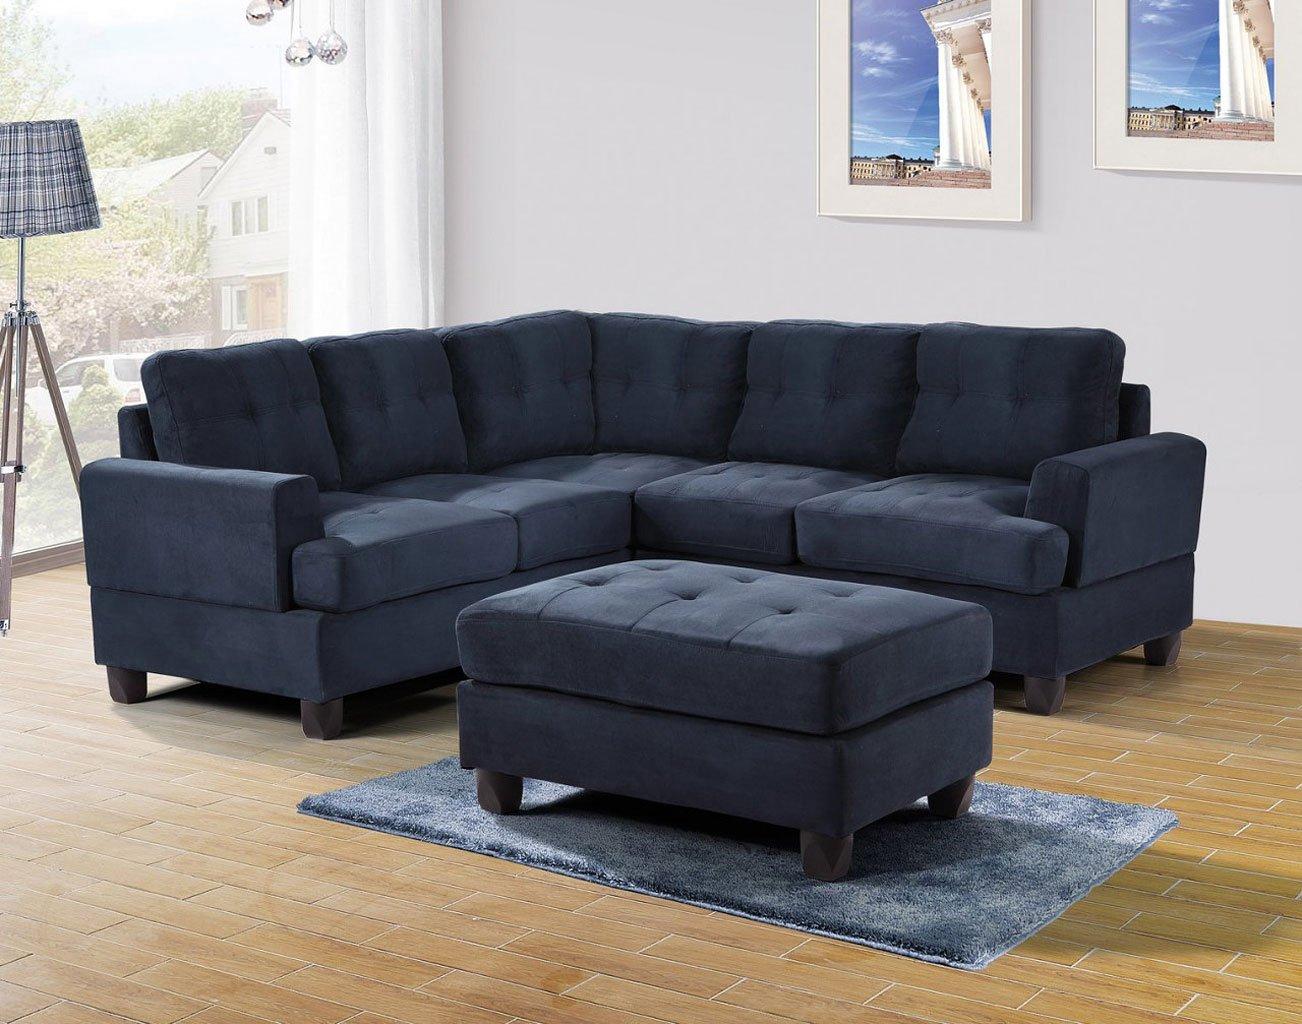 g510 corner sectional set navy blue g510b sc g630 o glory furniture